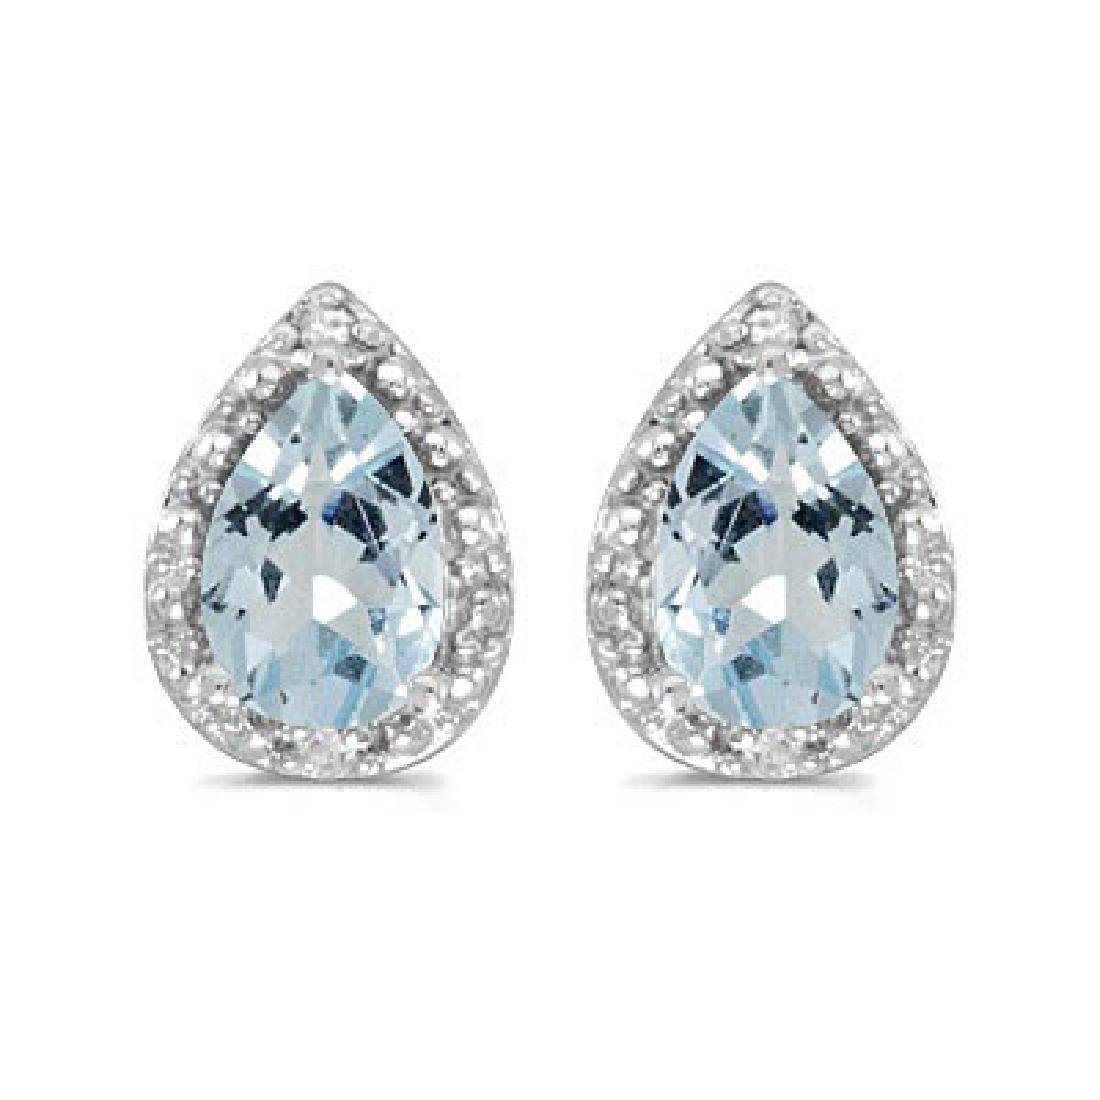 Pear Aquamarine and Diamond Stud Earrings 14k White Gol